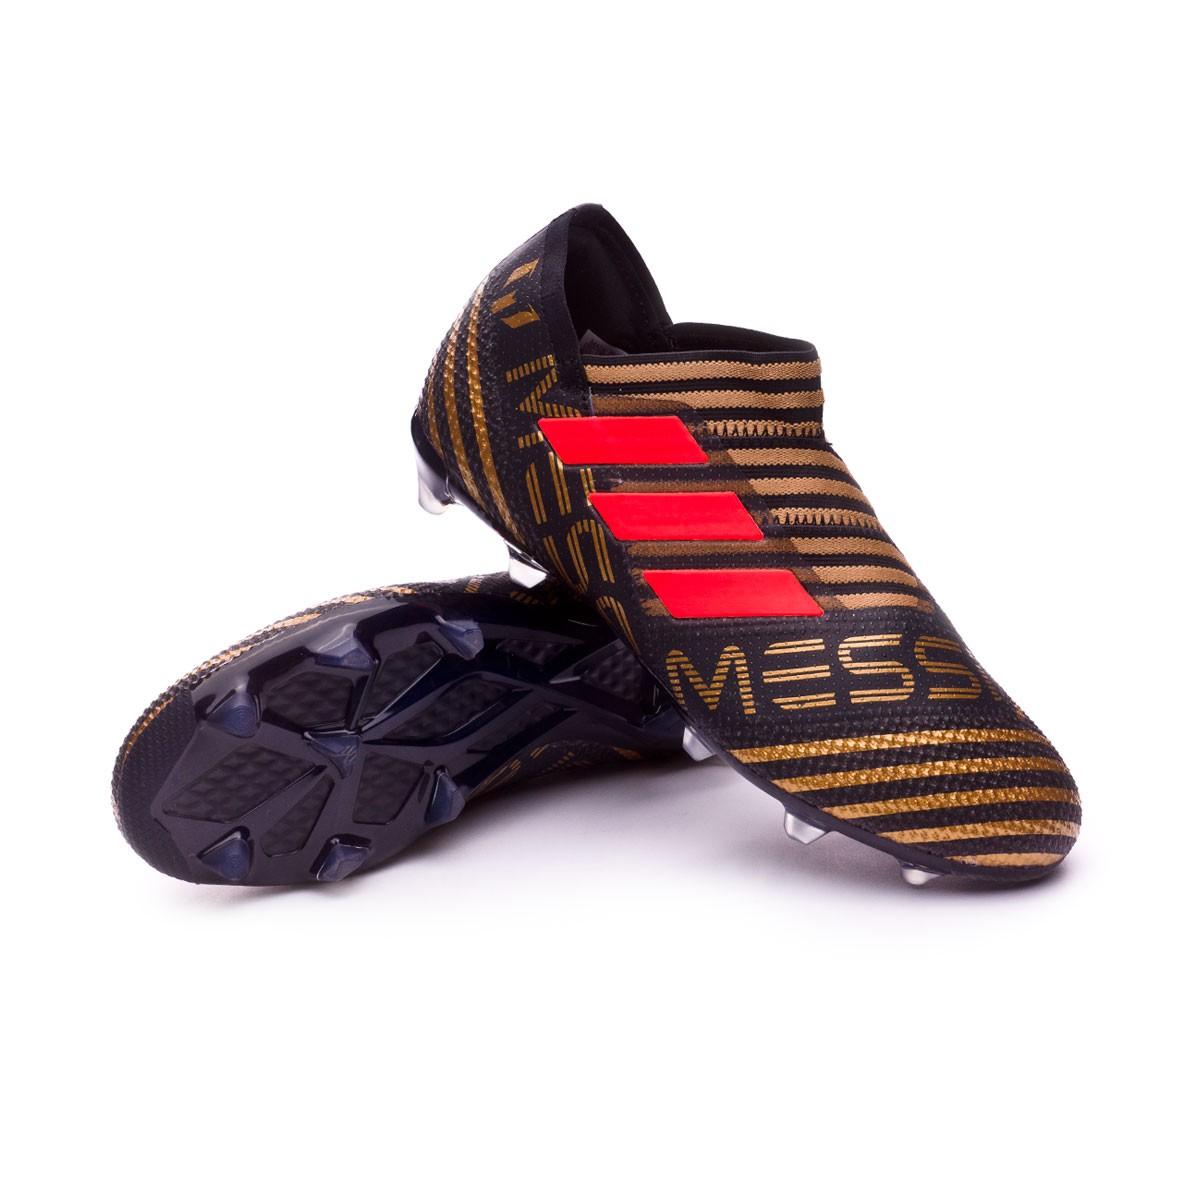 356fccb14 adidas Kids Nemeziz Messi 17+ 360 Agility Football Boots. Core black-Solar  red-Tactile ...